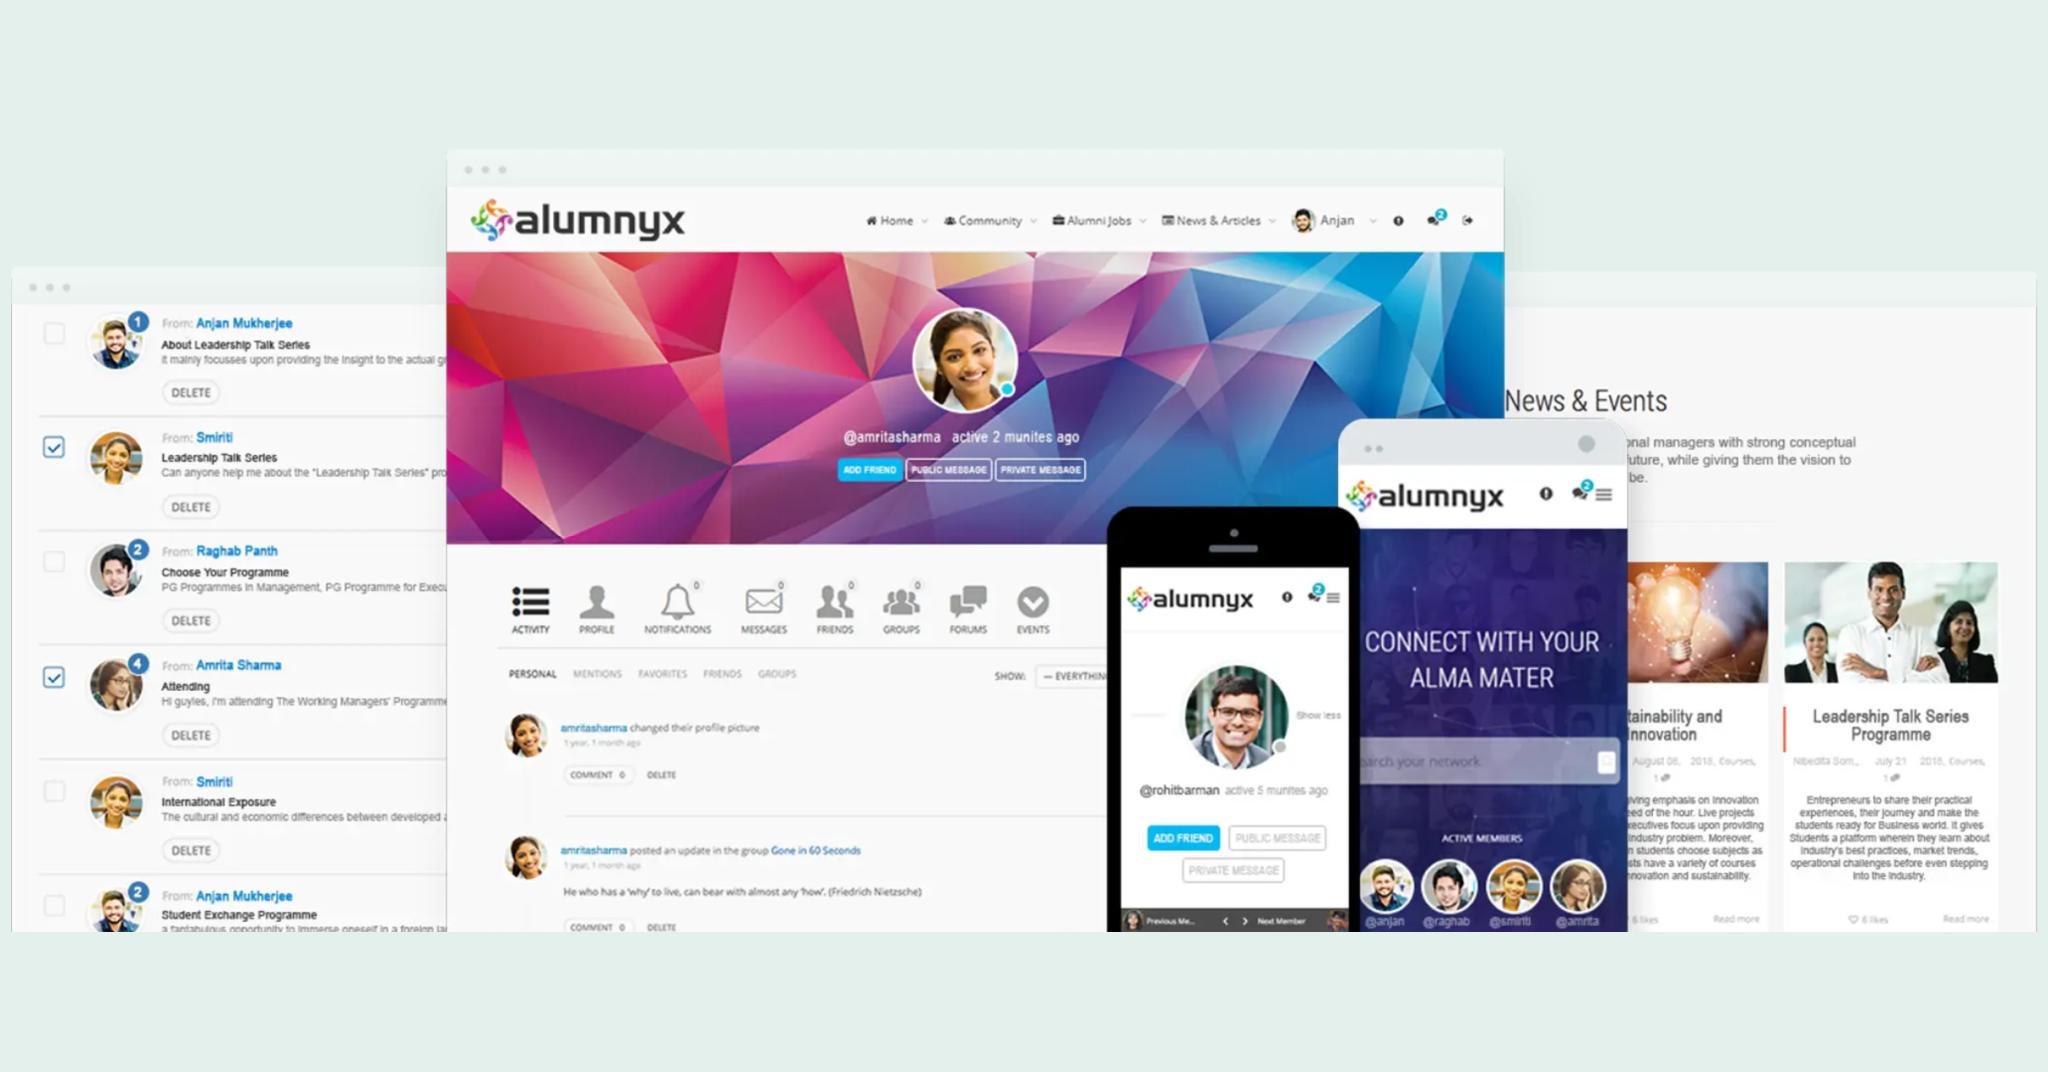 Alumnyx